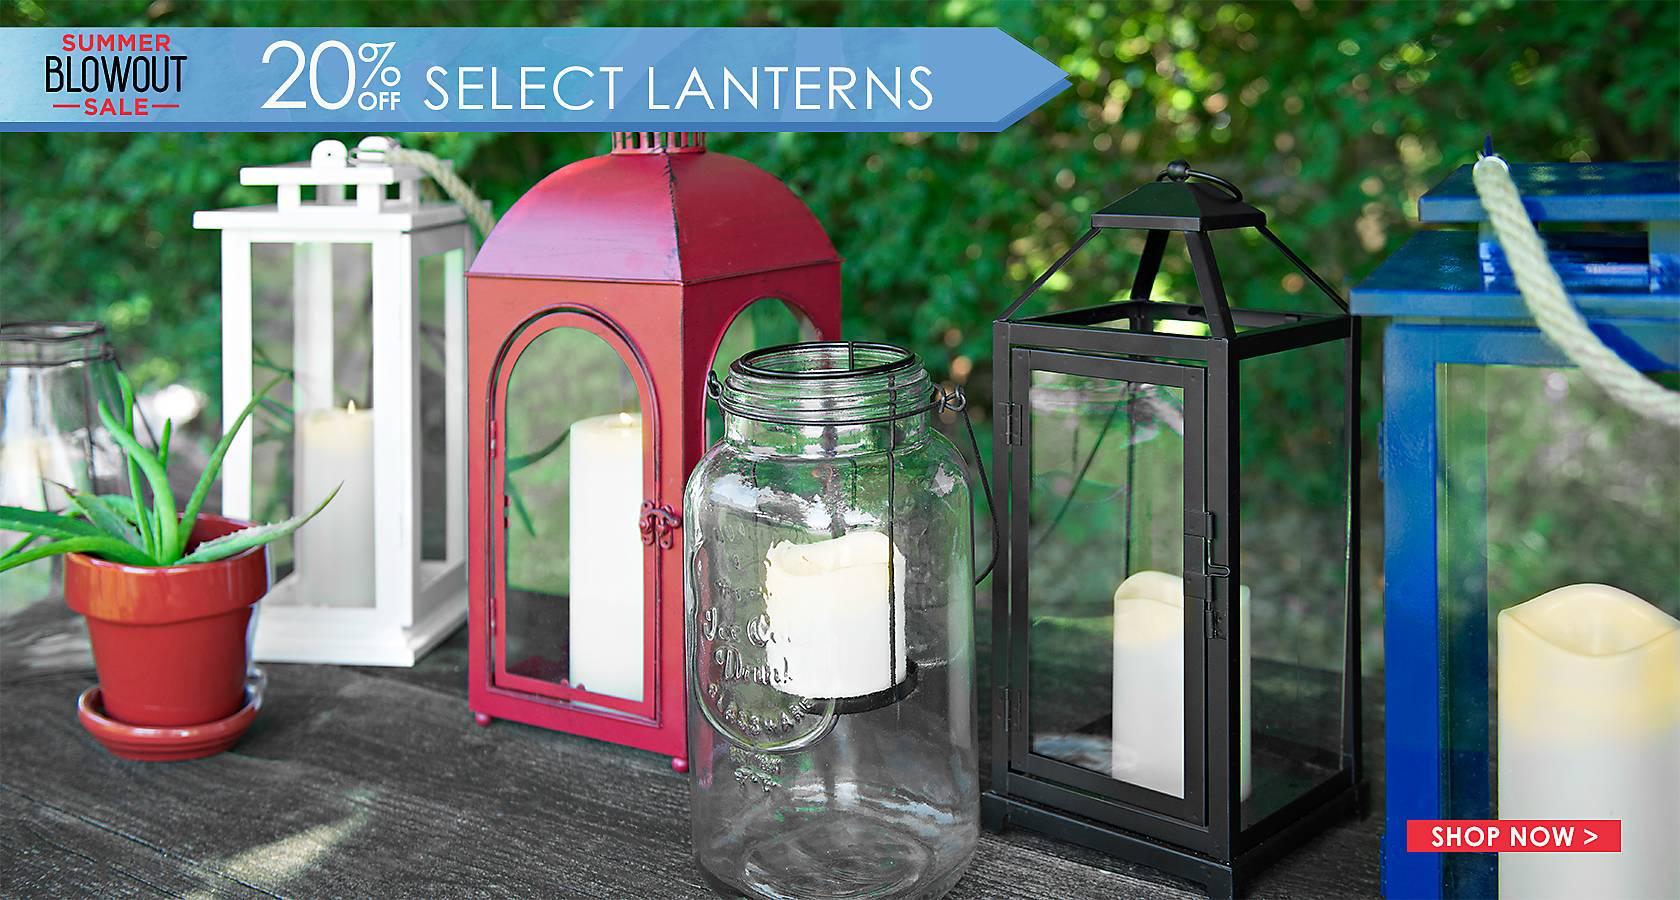 20% Off Select Lanterns - Shop Now